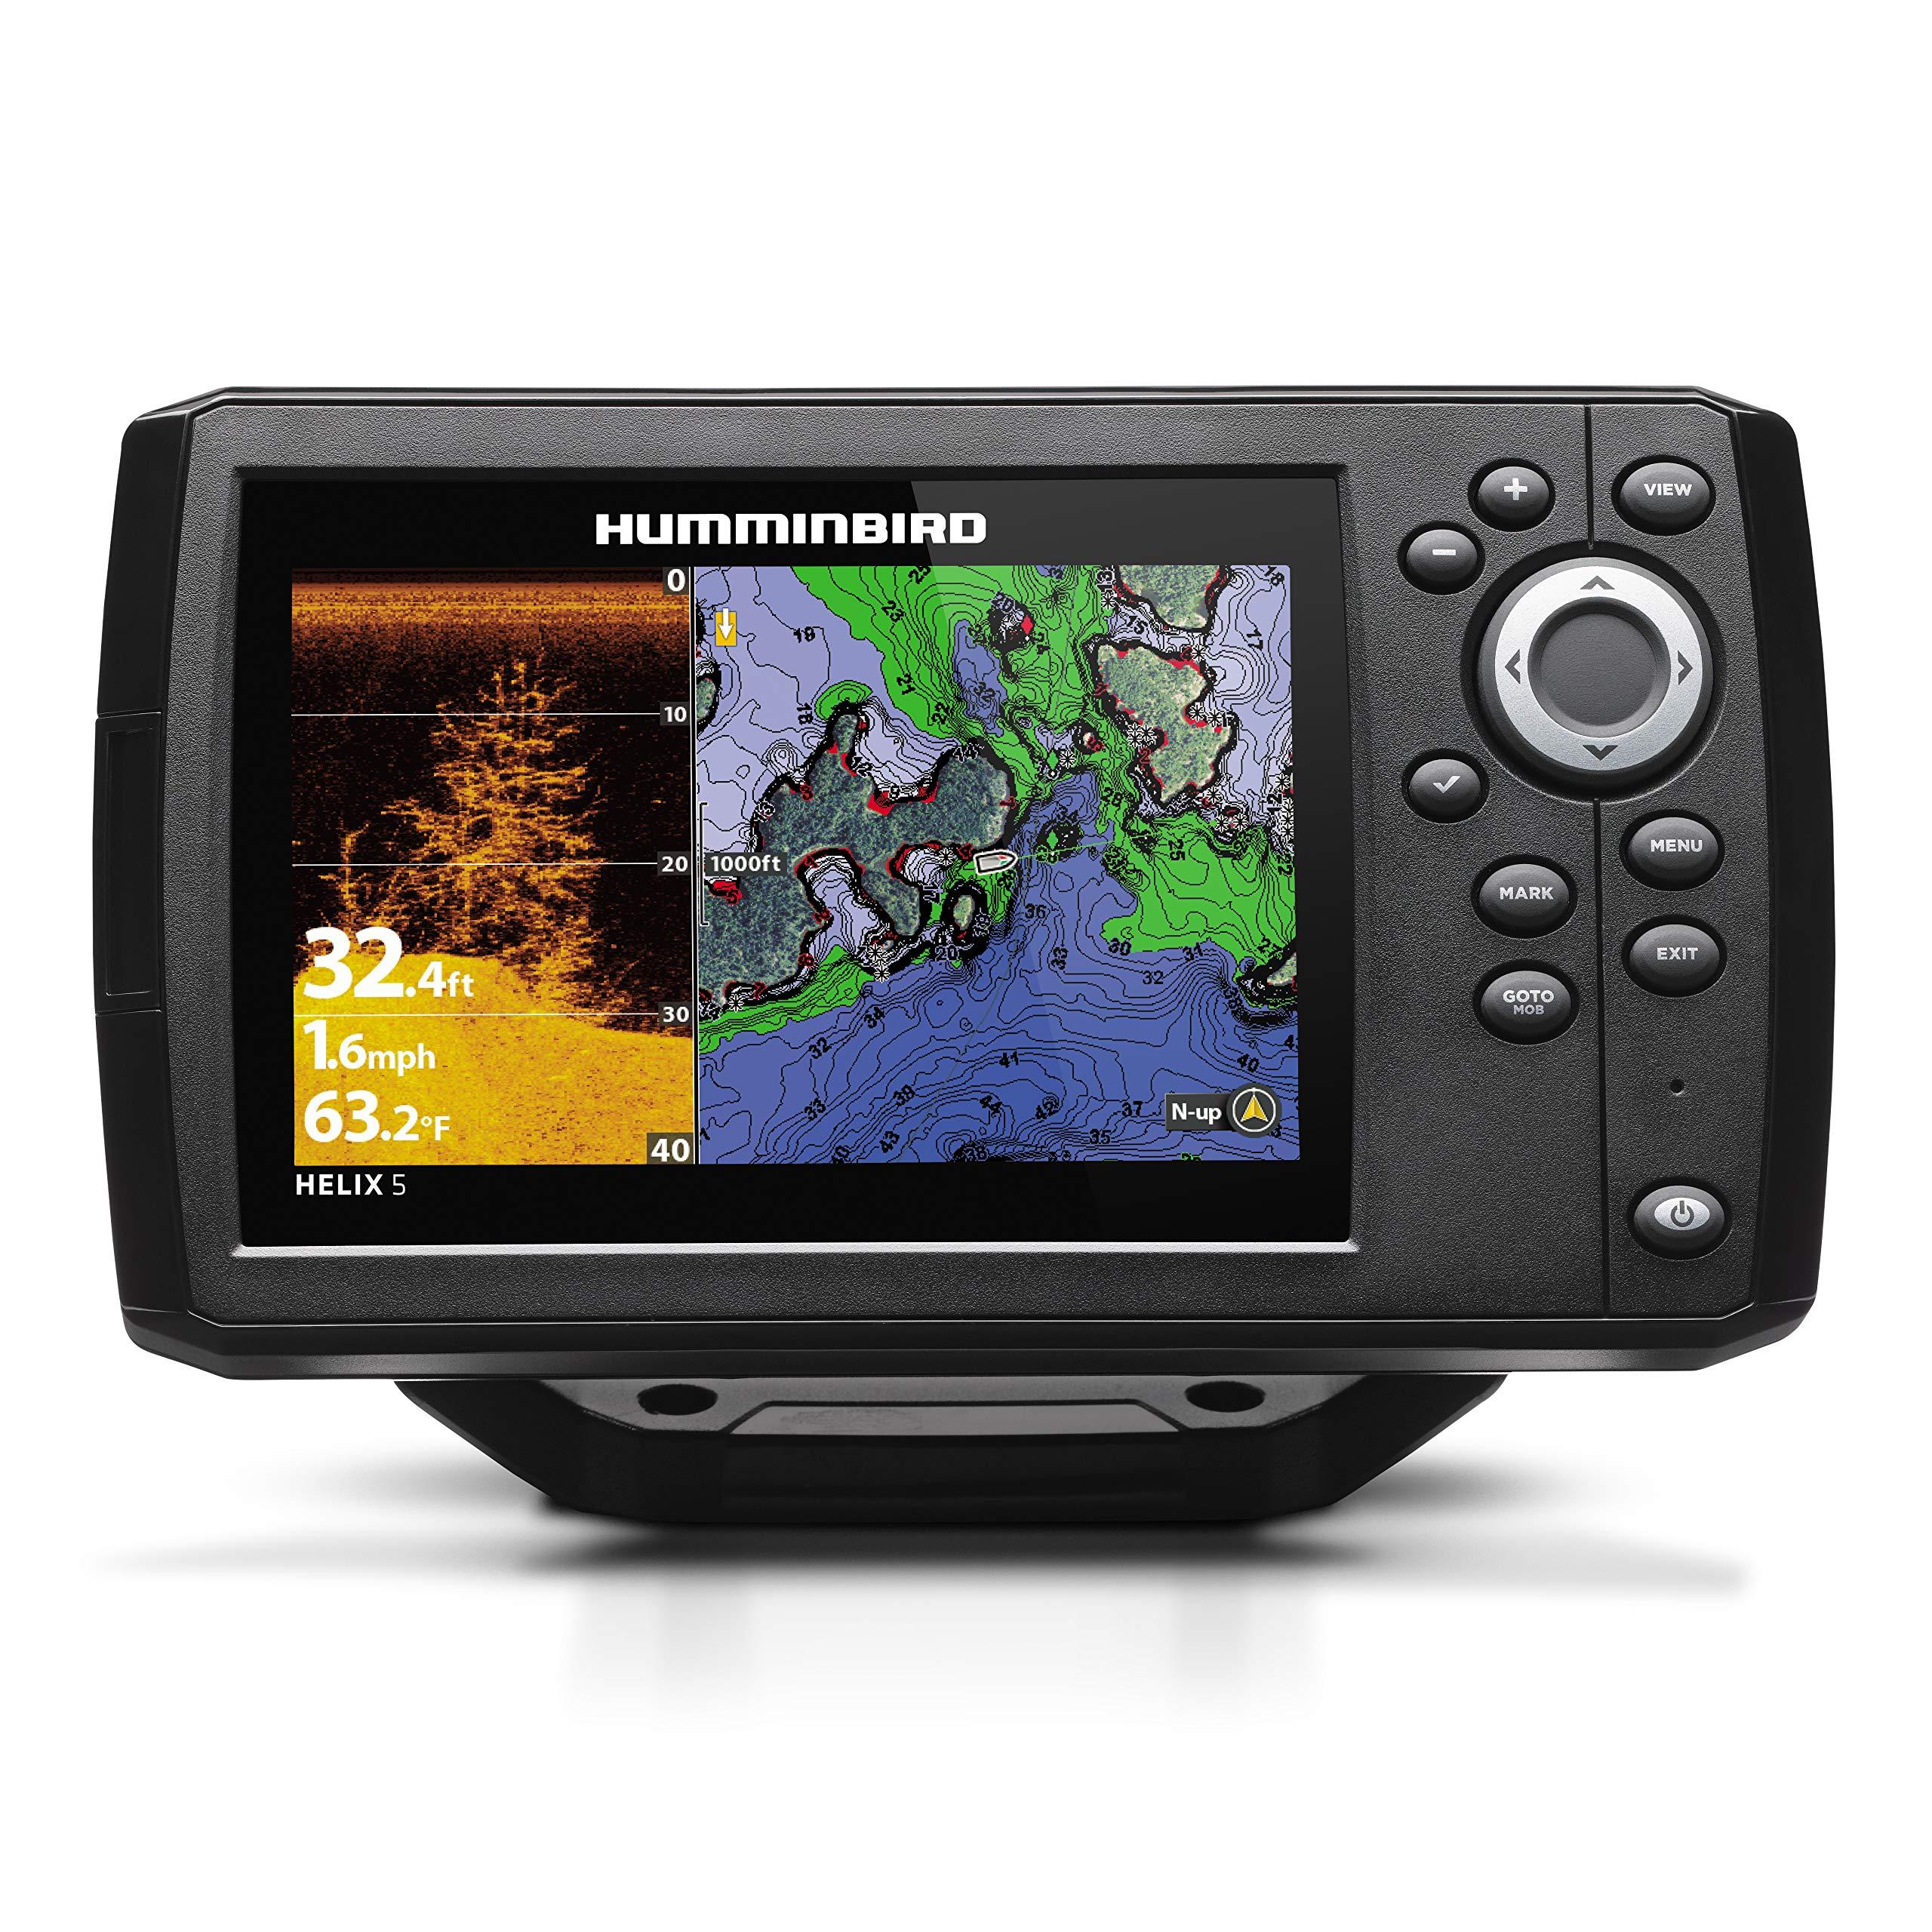 Humminbird 410220-1 Helix 5, Chirp Di GPS G2, by Humminbird